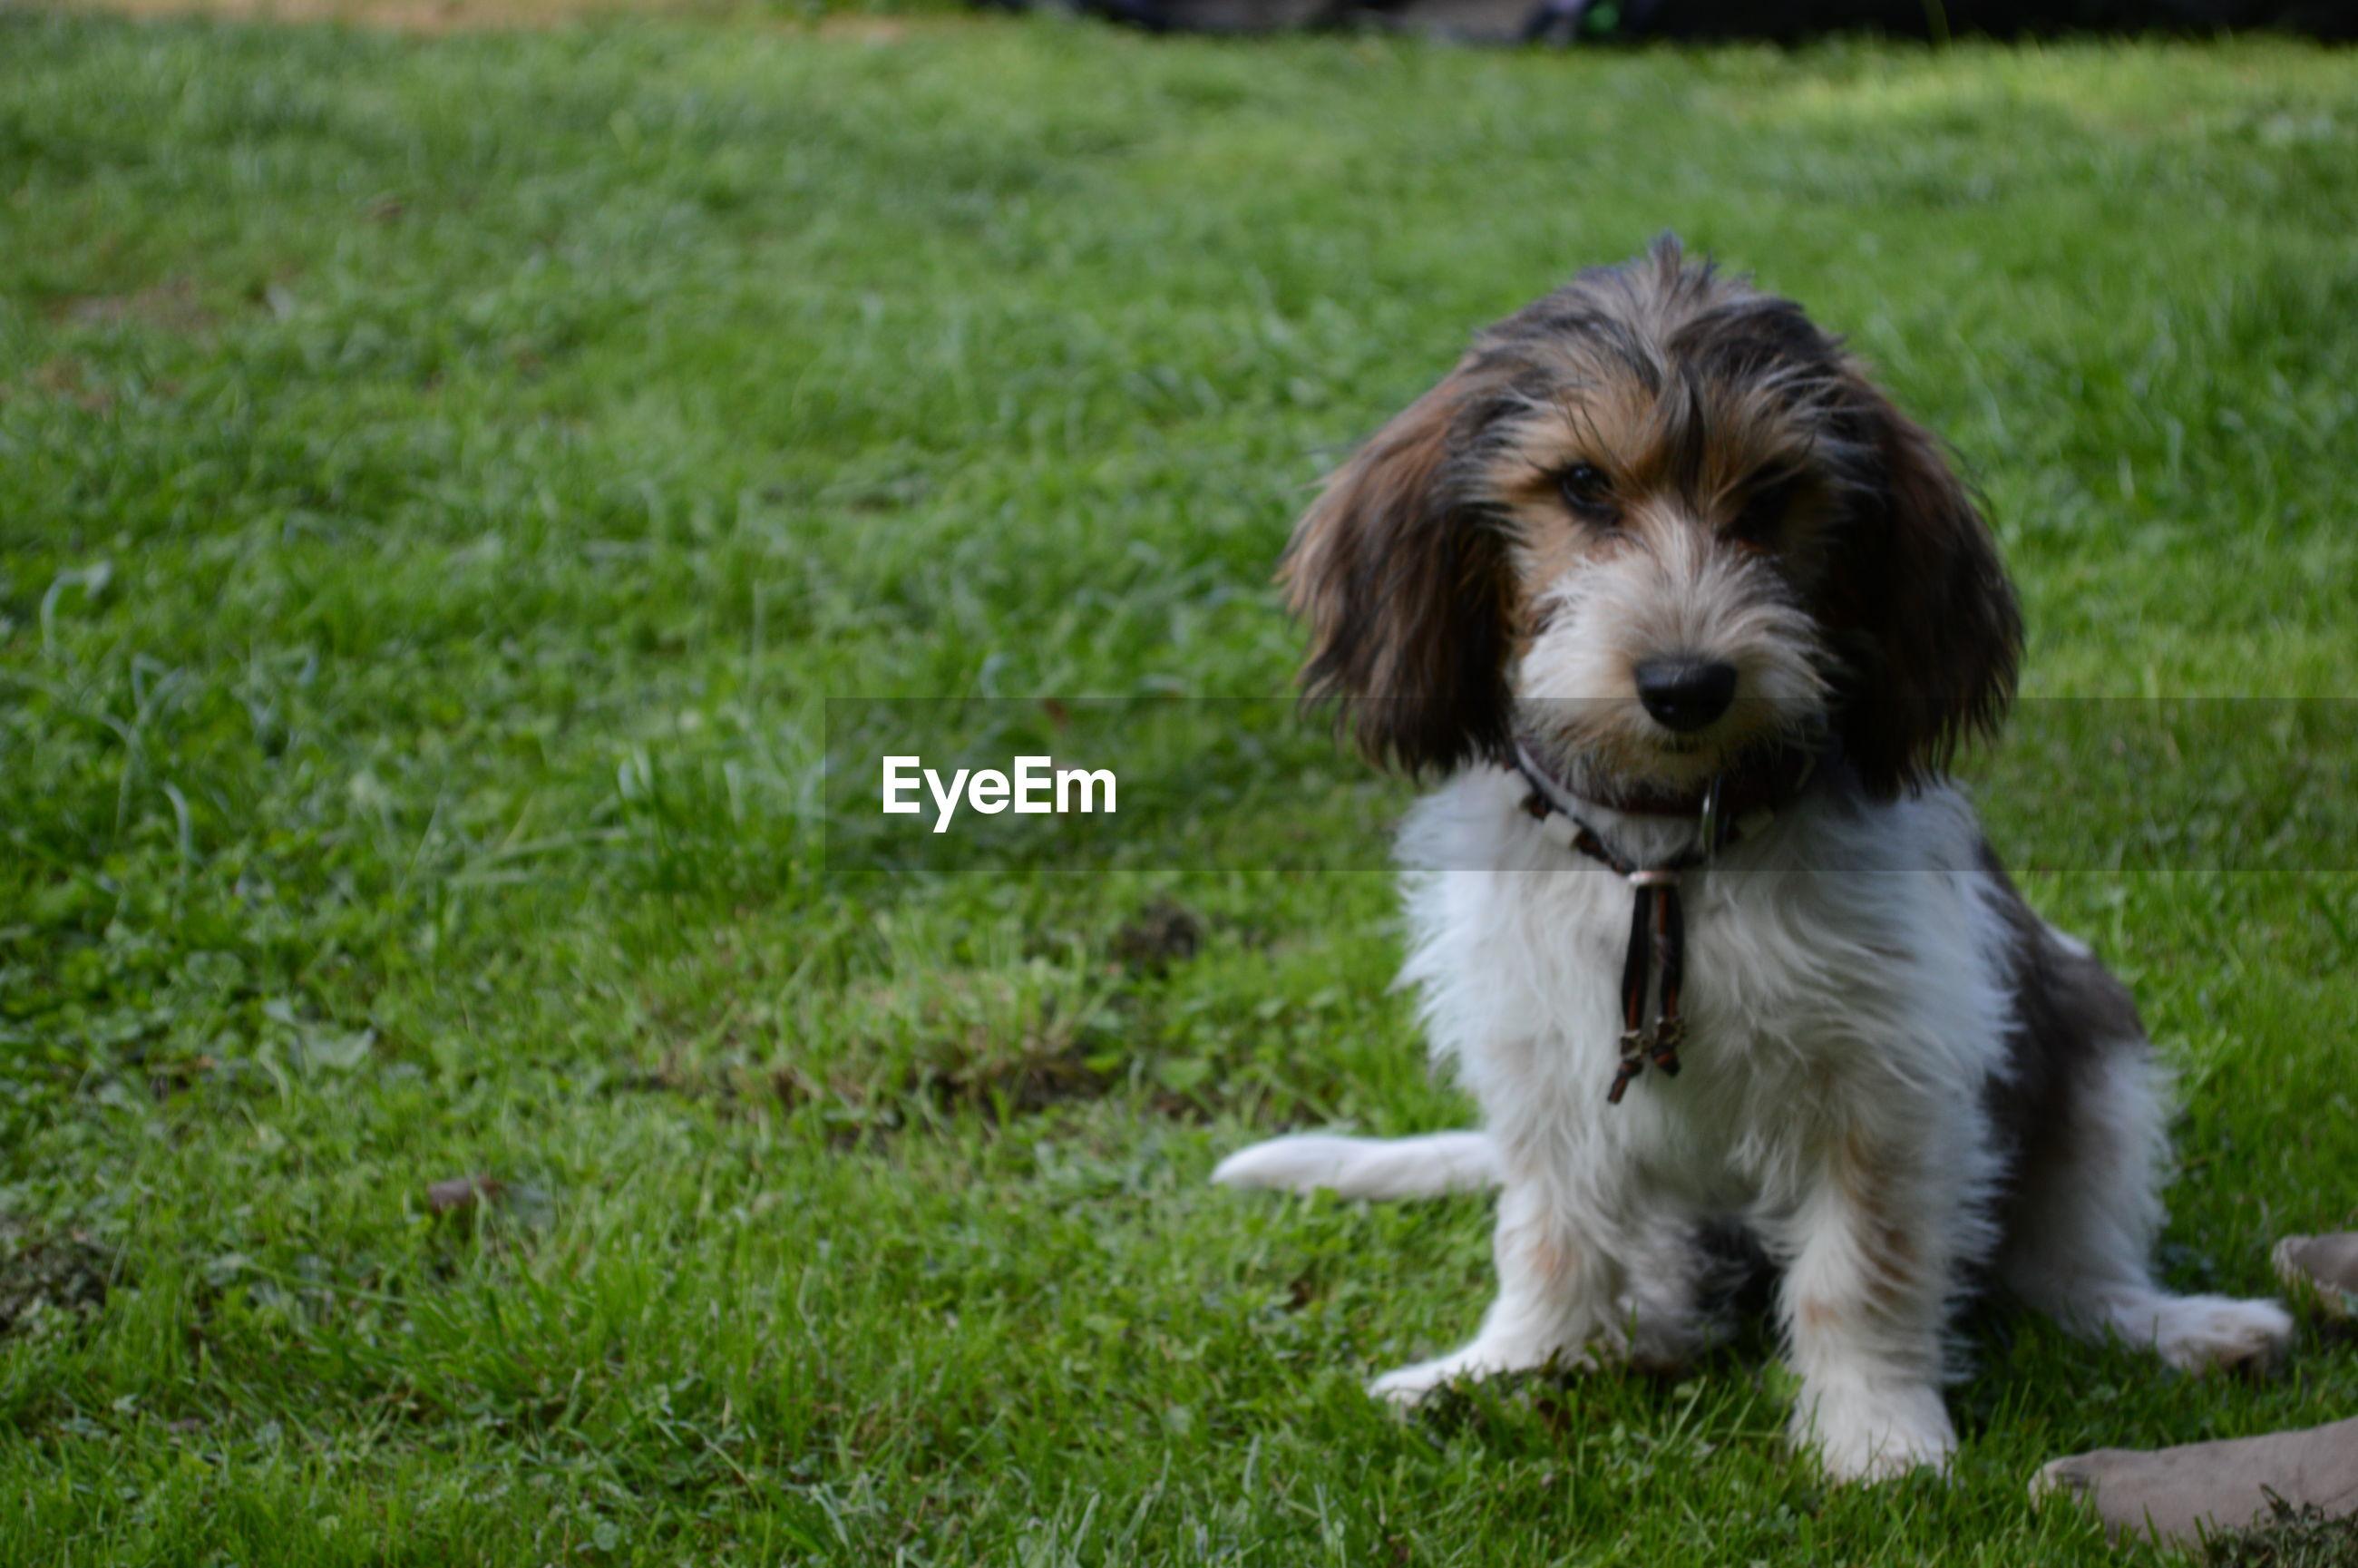 PORTRAIT OF DOG ON GRASS FIELD